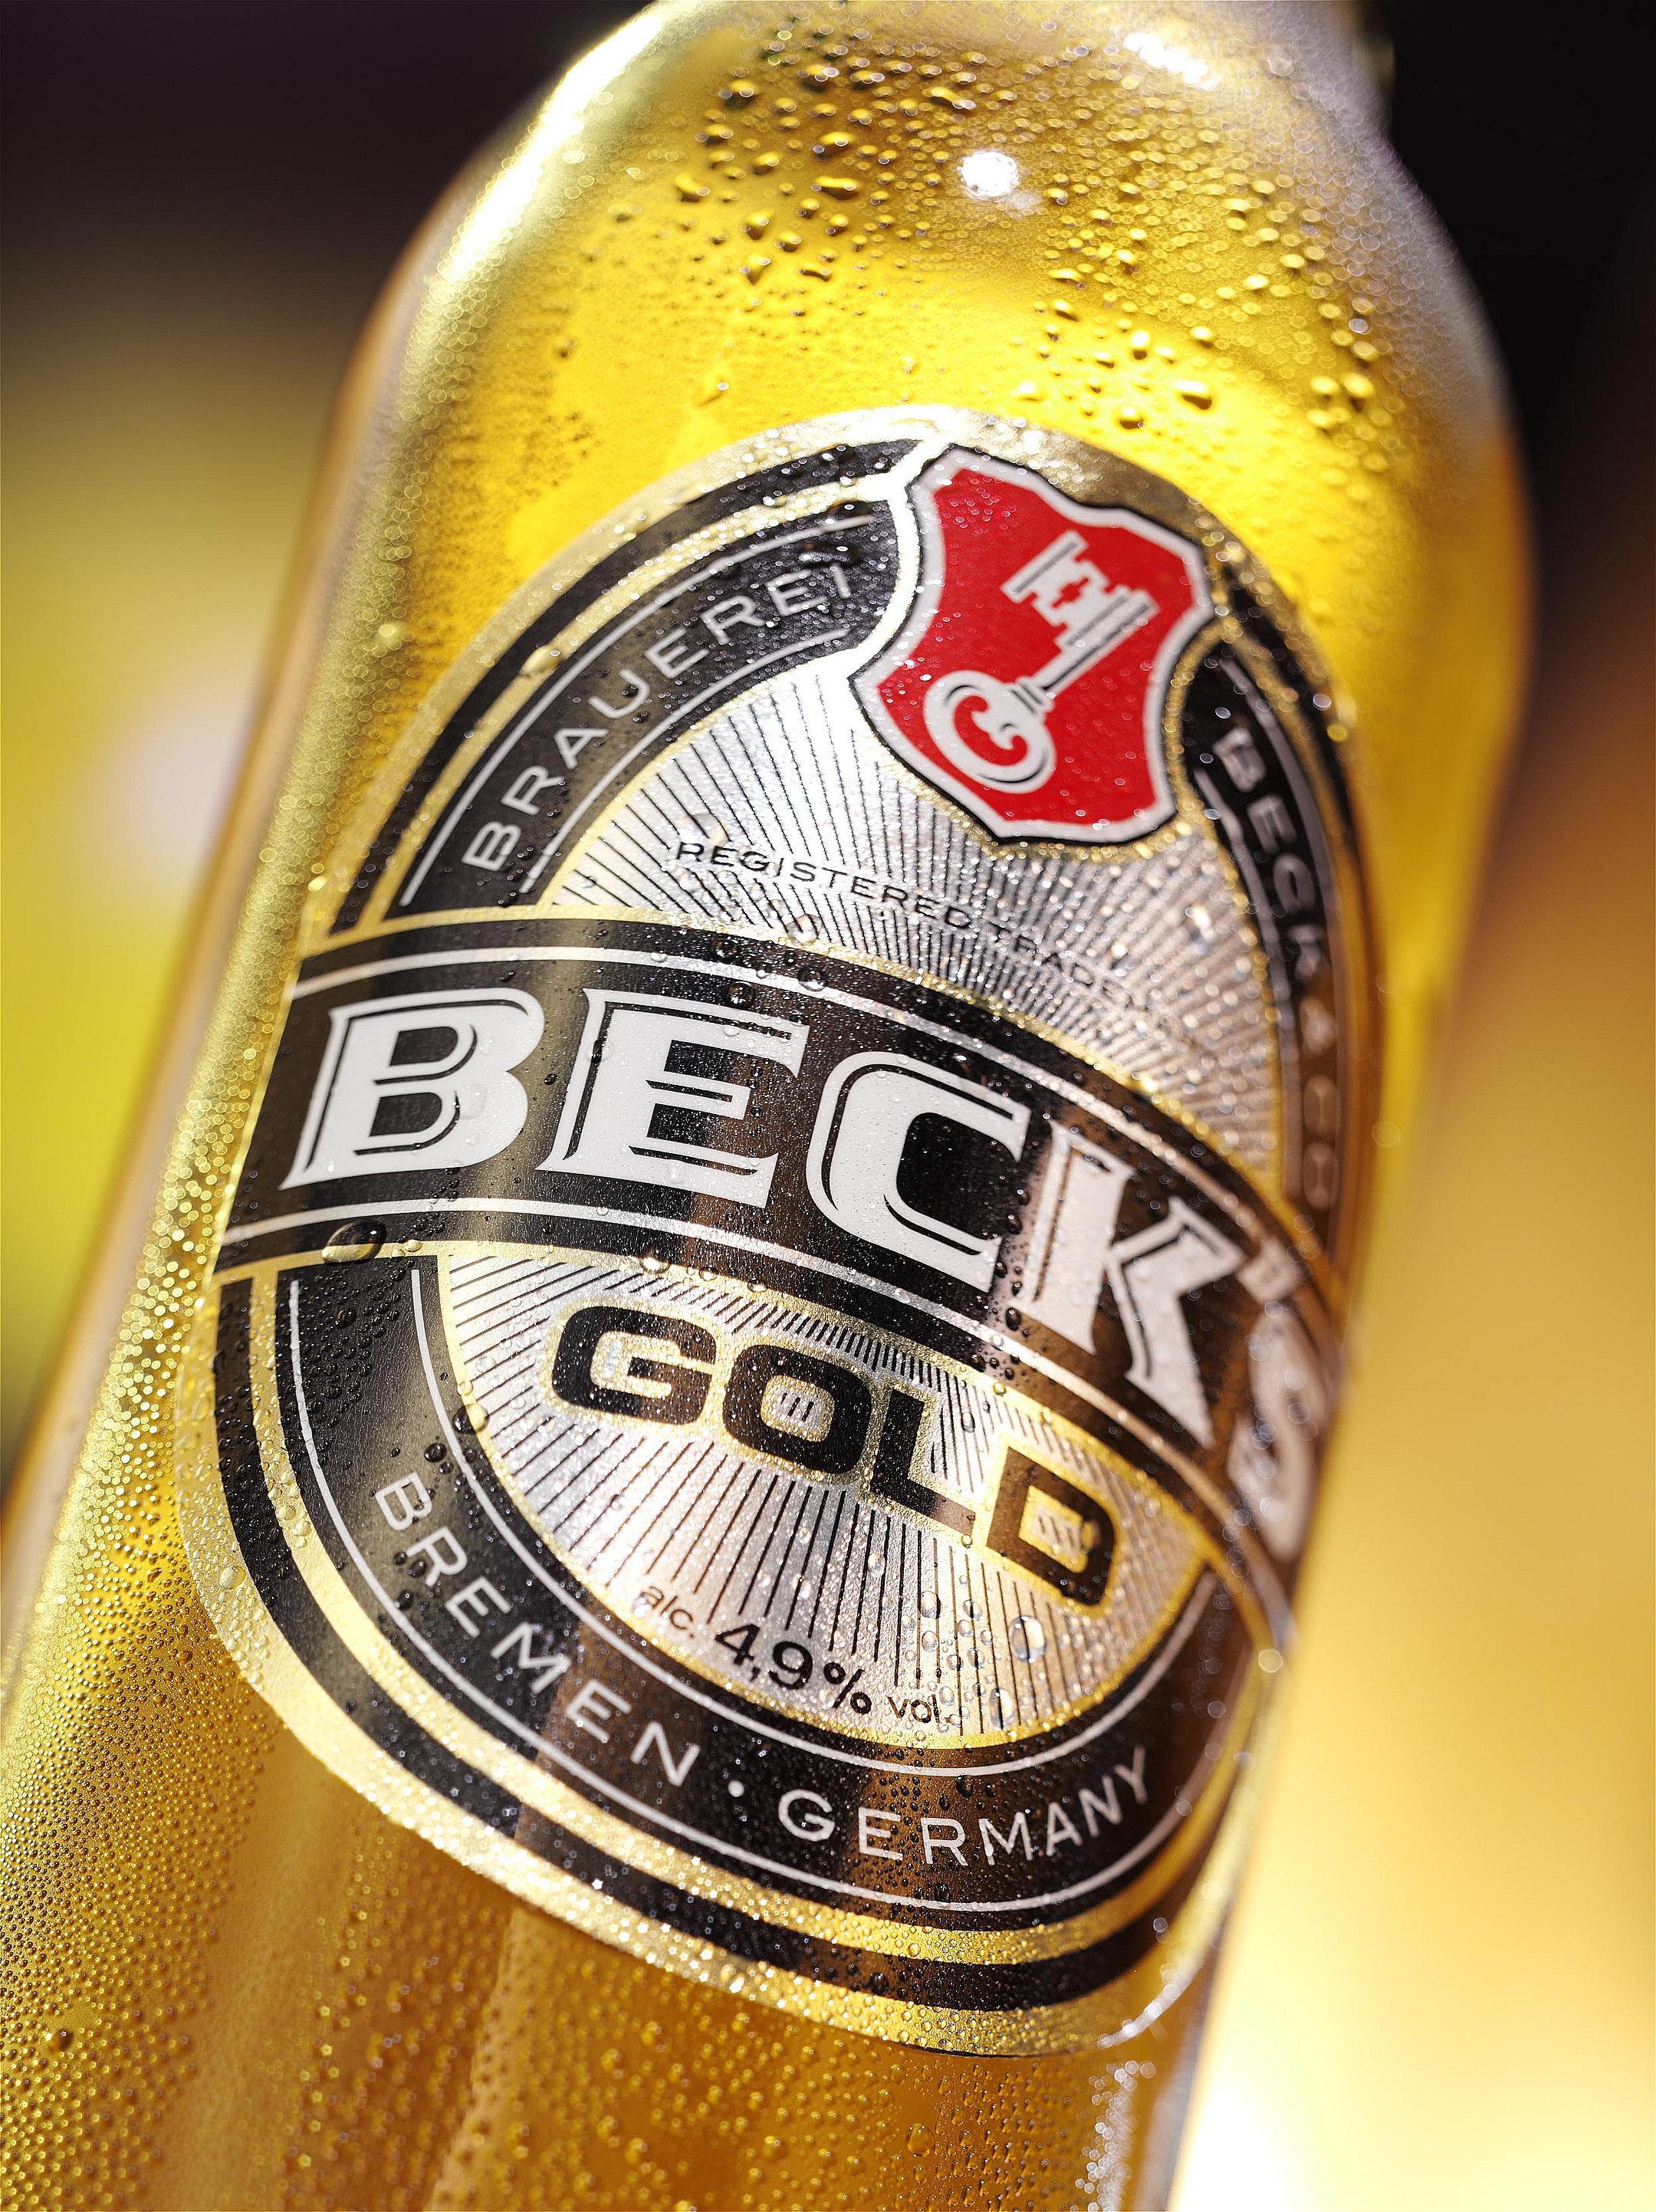 Bierflasche Becks Gold frisch Betaut